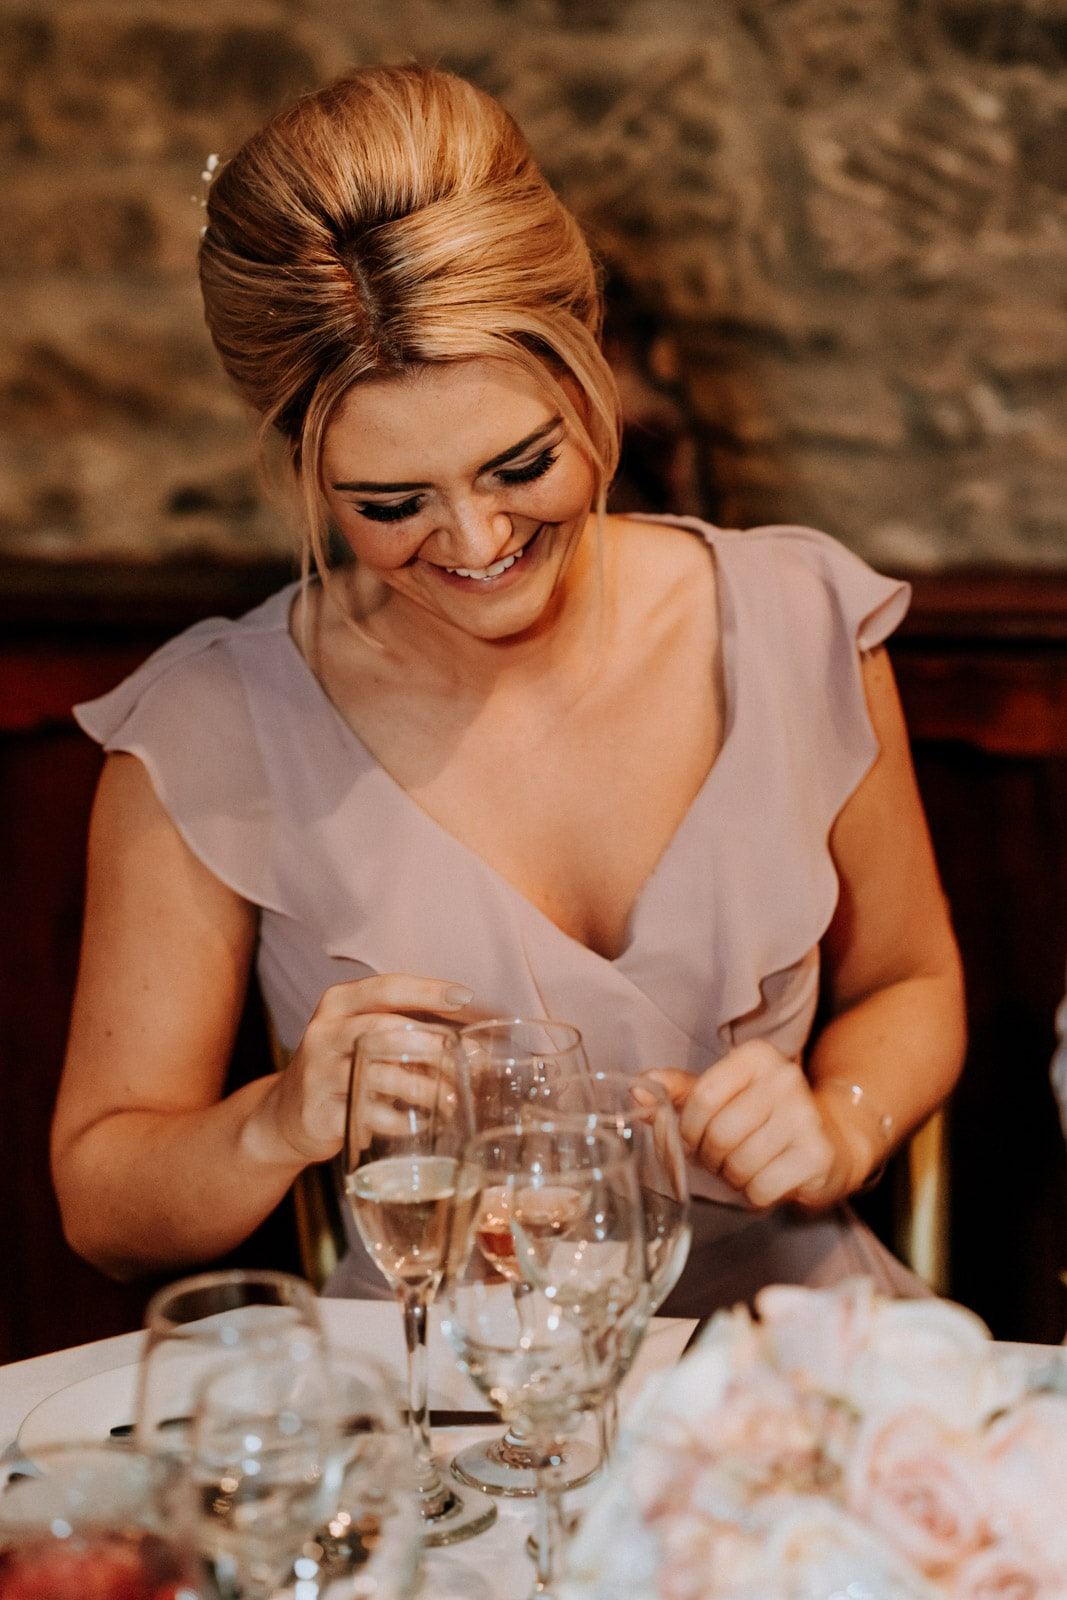 Oran-Mor-Wedding-Photographer-DearlyPhotography (42 of 55).jpg